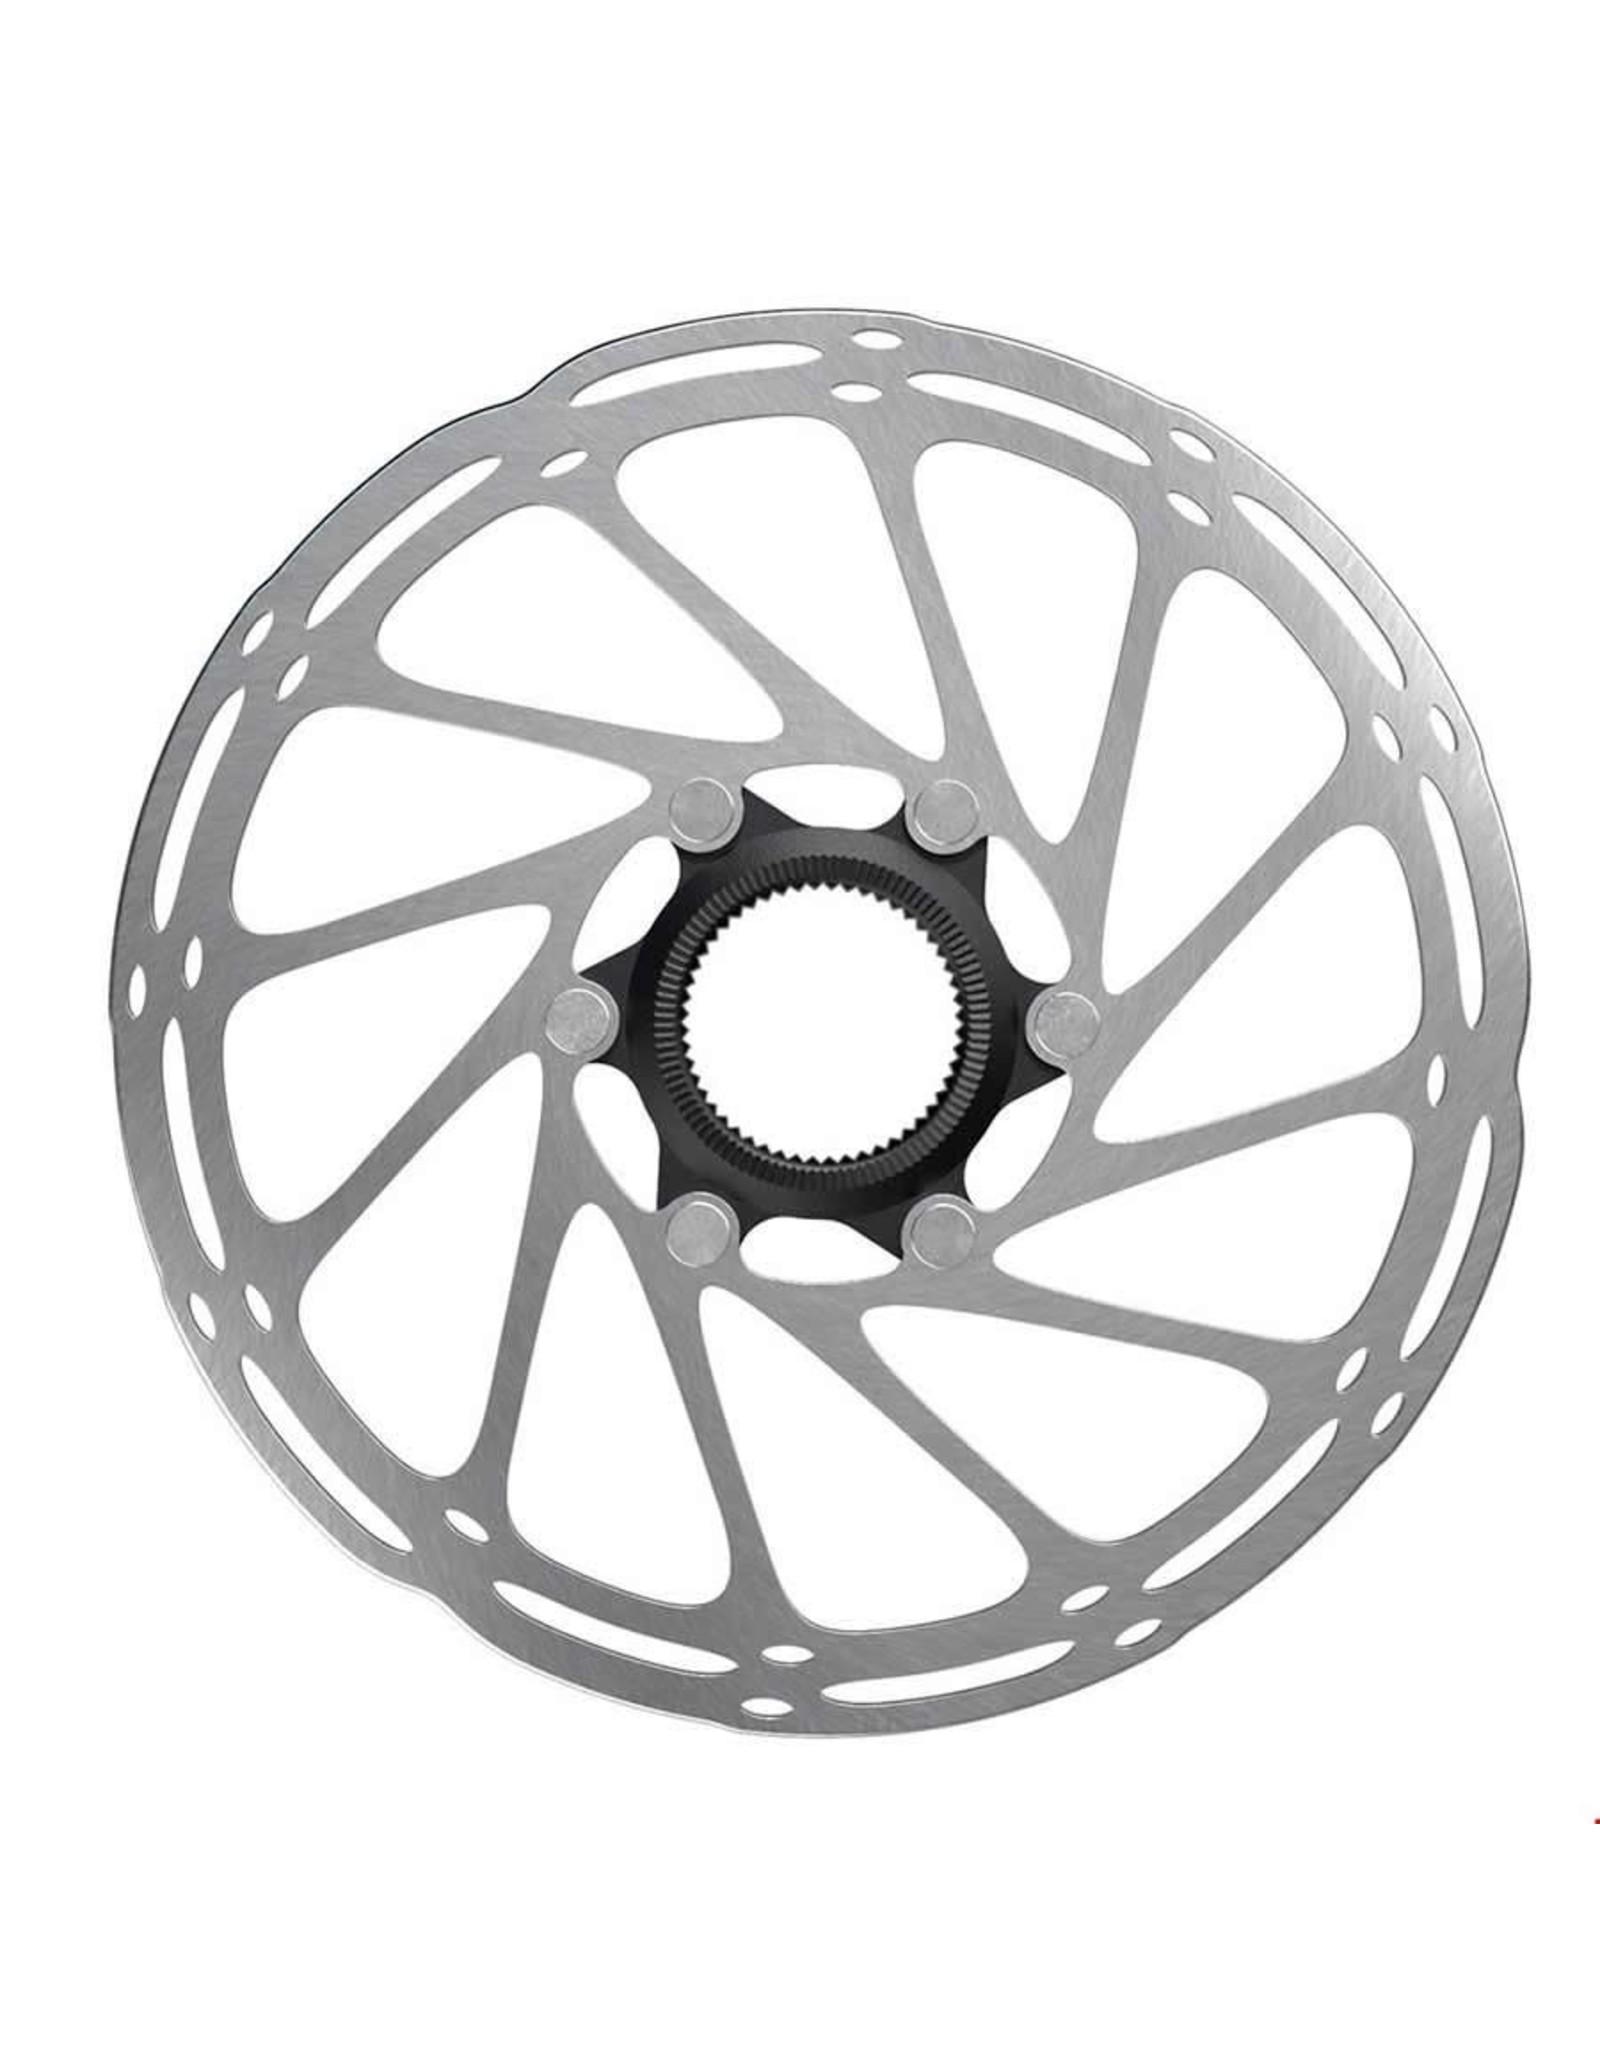 SRAM Rotor SRAM Centerline rounded center lock